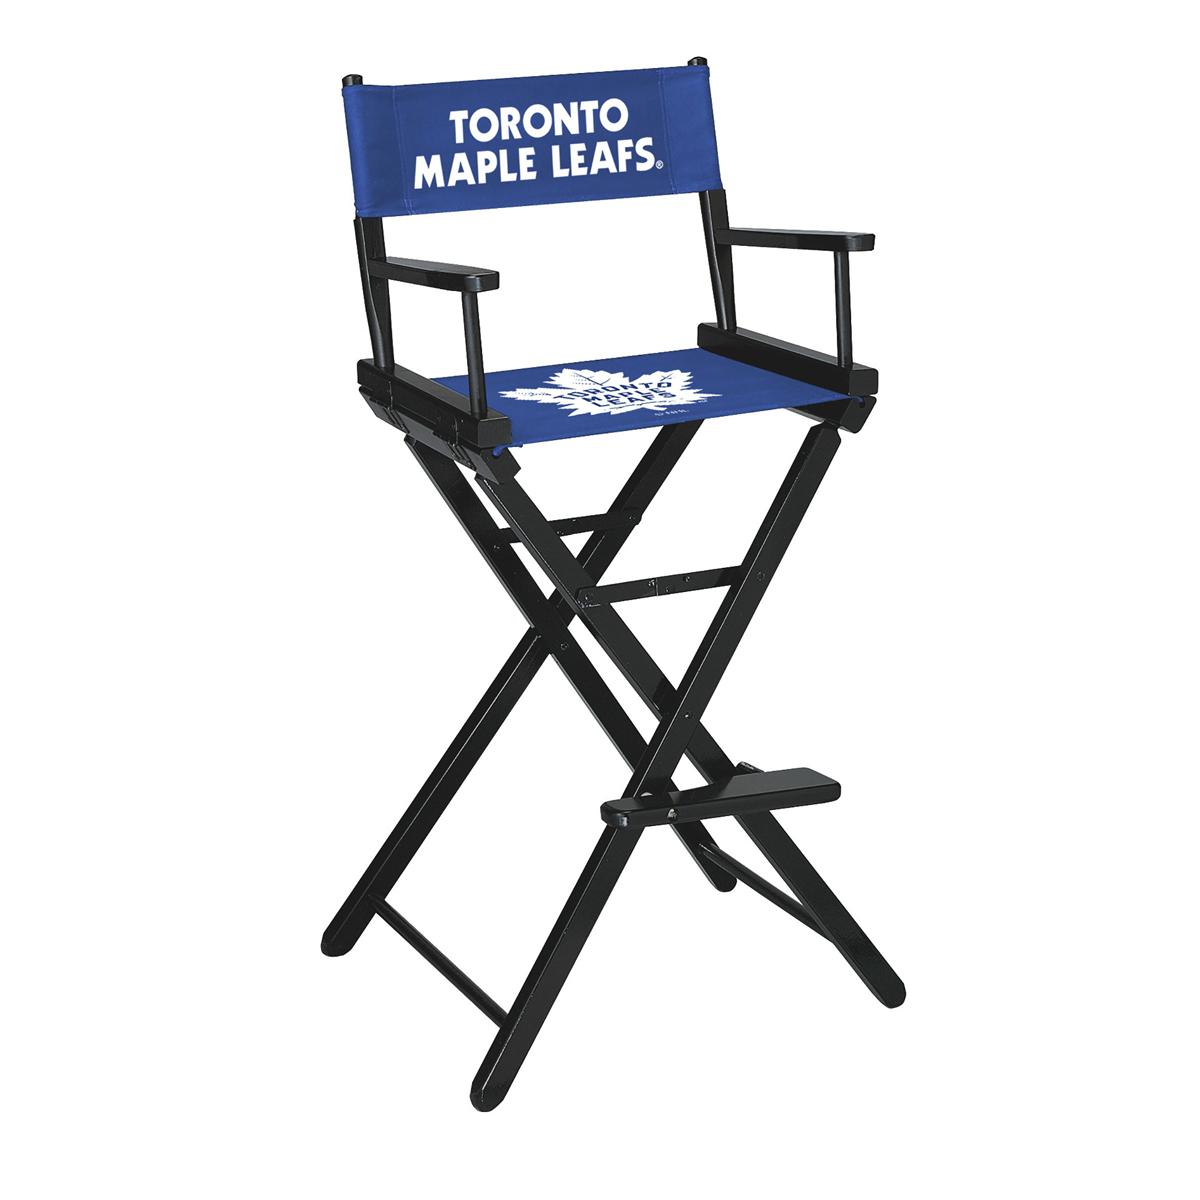 TORONTO MAPLE LEAFS® BAR HEIGHT DIRECTORS CHAIR